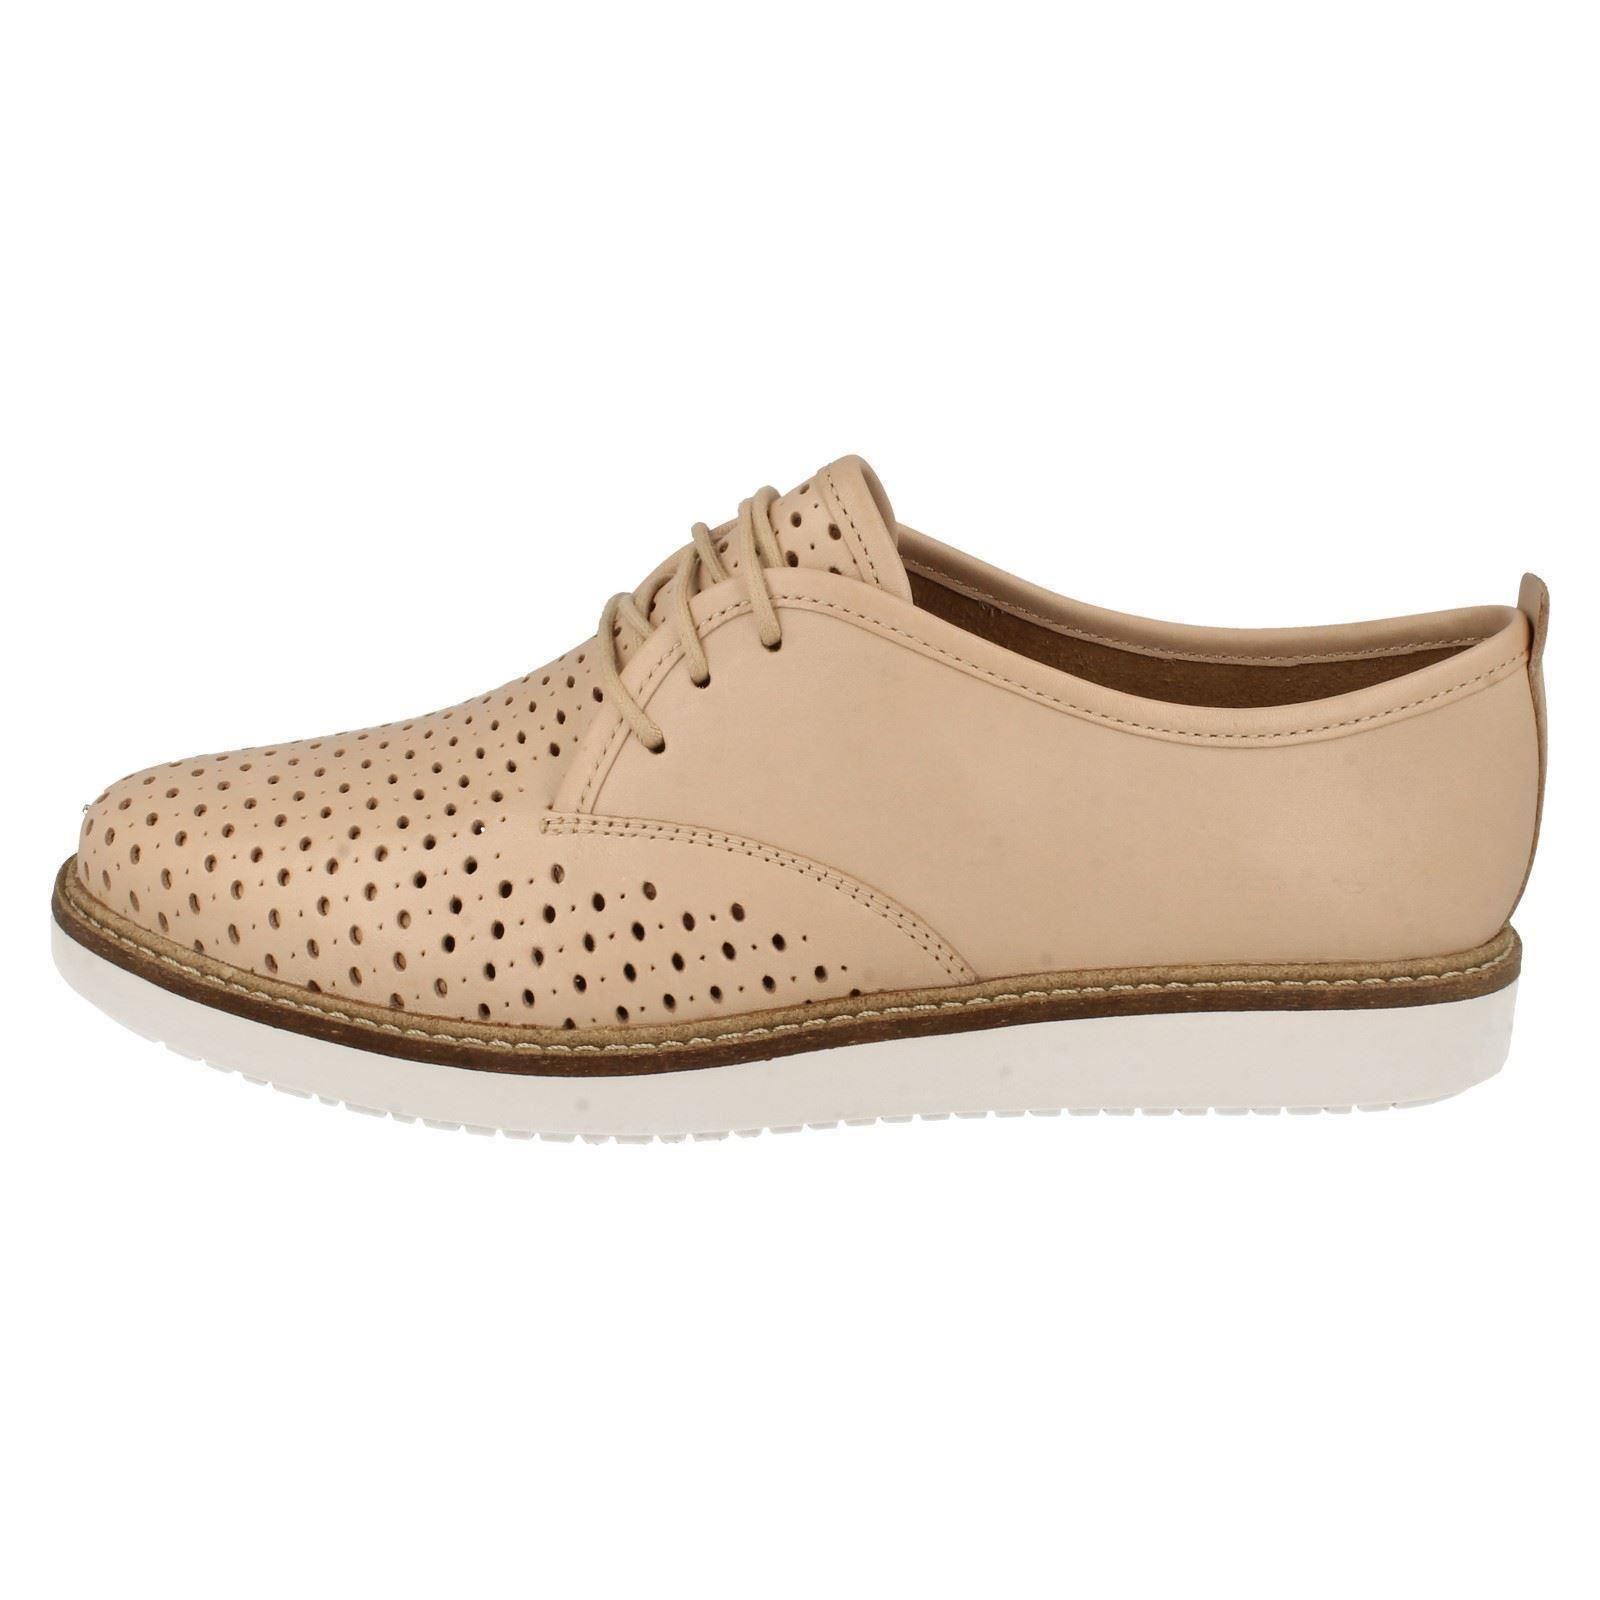 Ladies Clarks Casual Shoes /'Glick Resseta/'